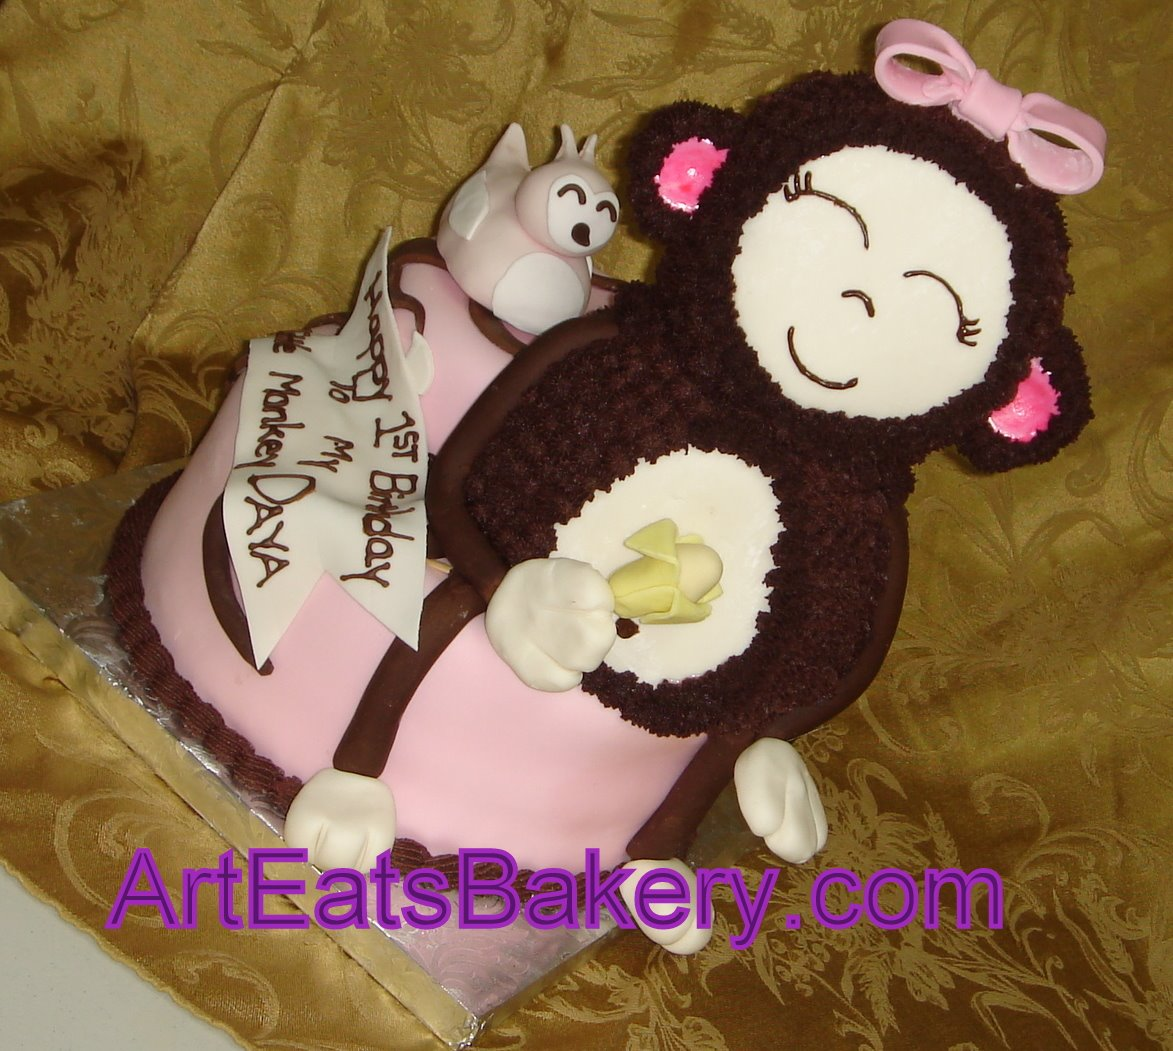 arteatsbakery  Custom designed artistic cake pictures  Page 43